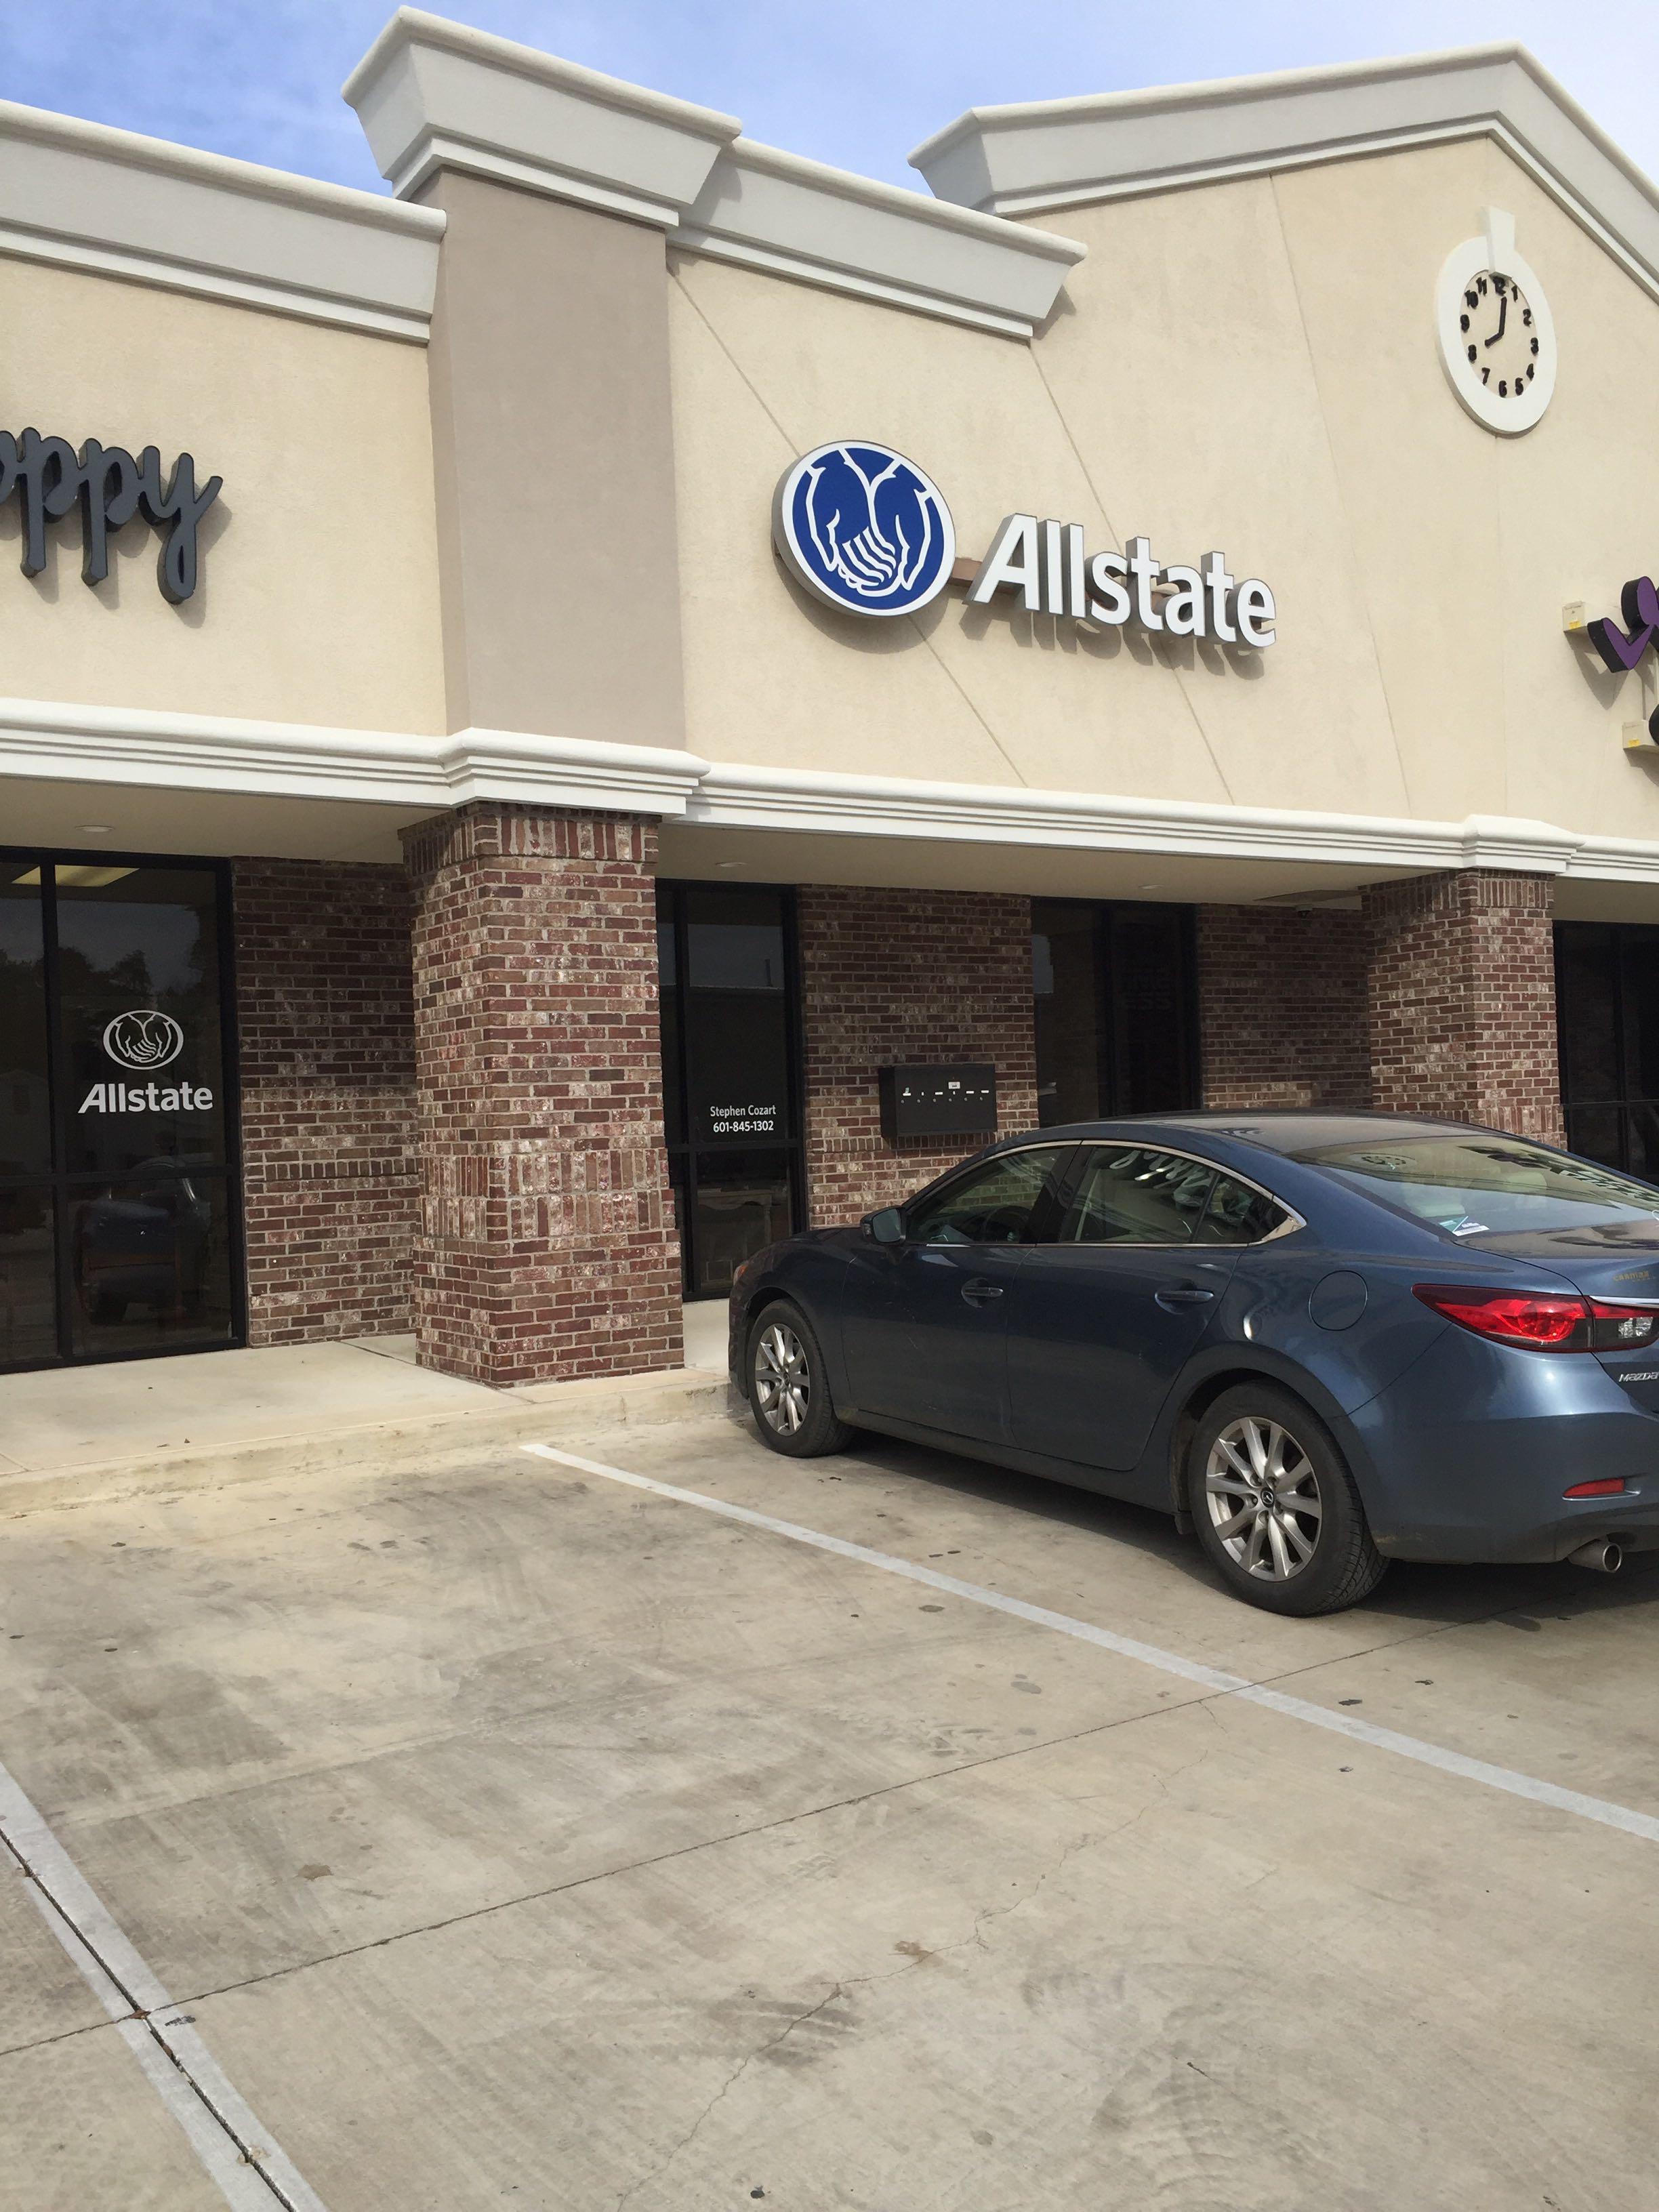 Stephen Cozart: Allstate Insurance image 0